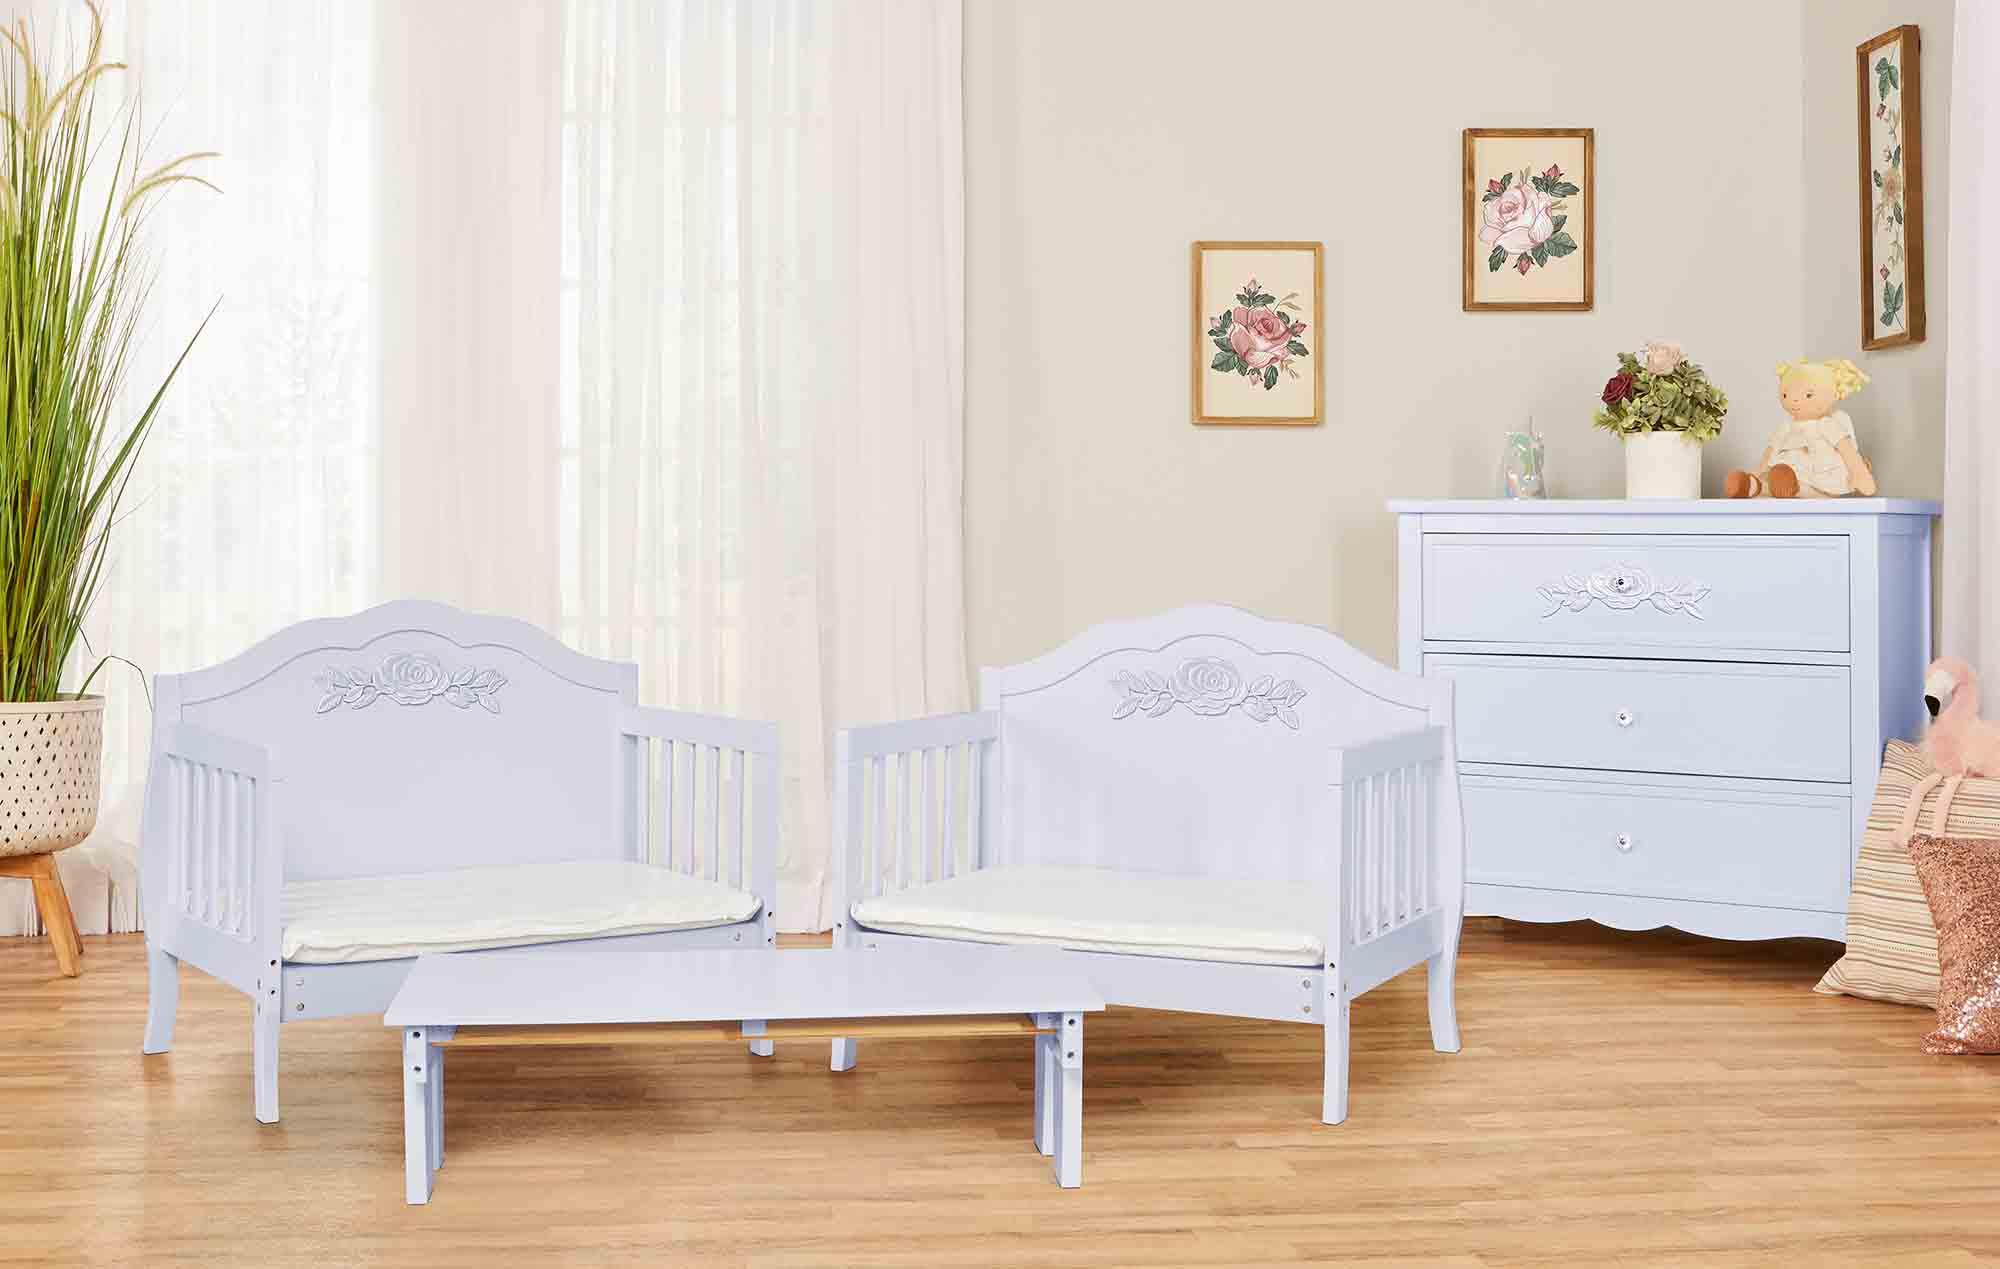 640_LAVD Rose Toddler Bed RmScene 01